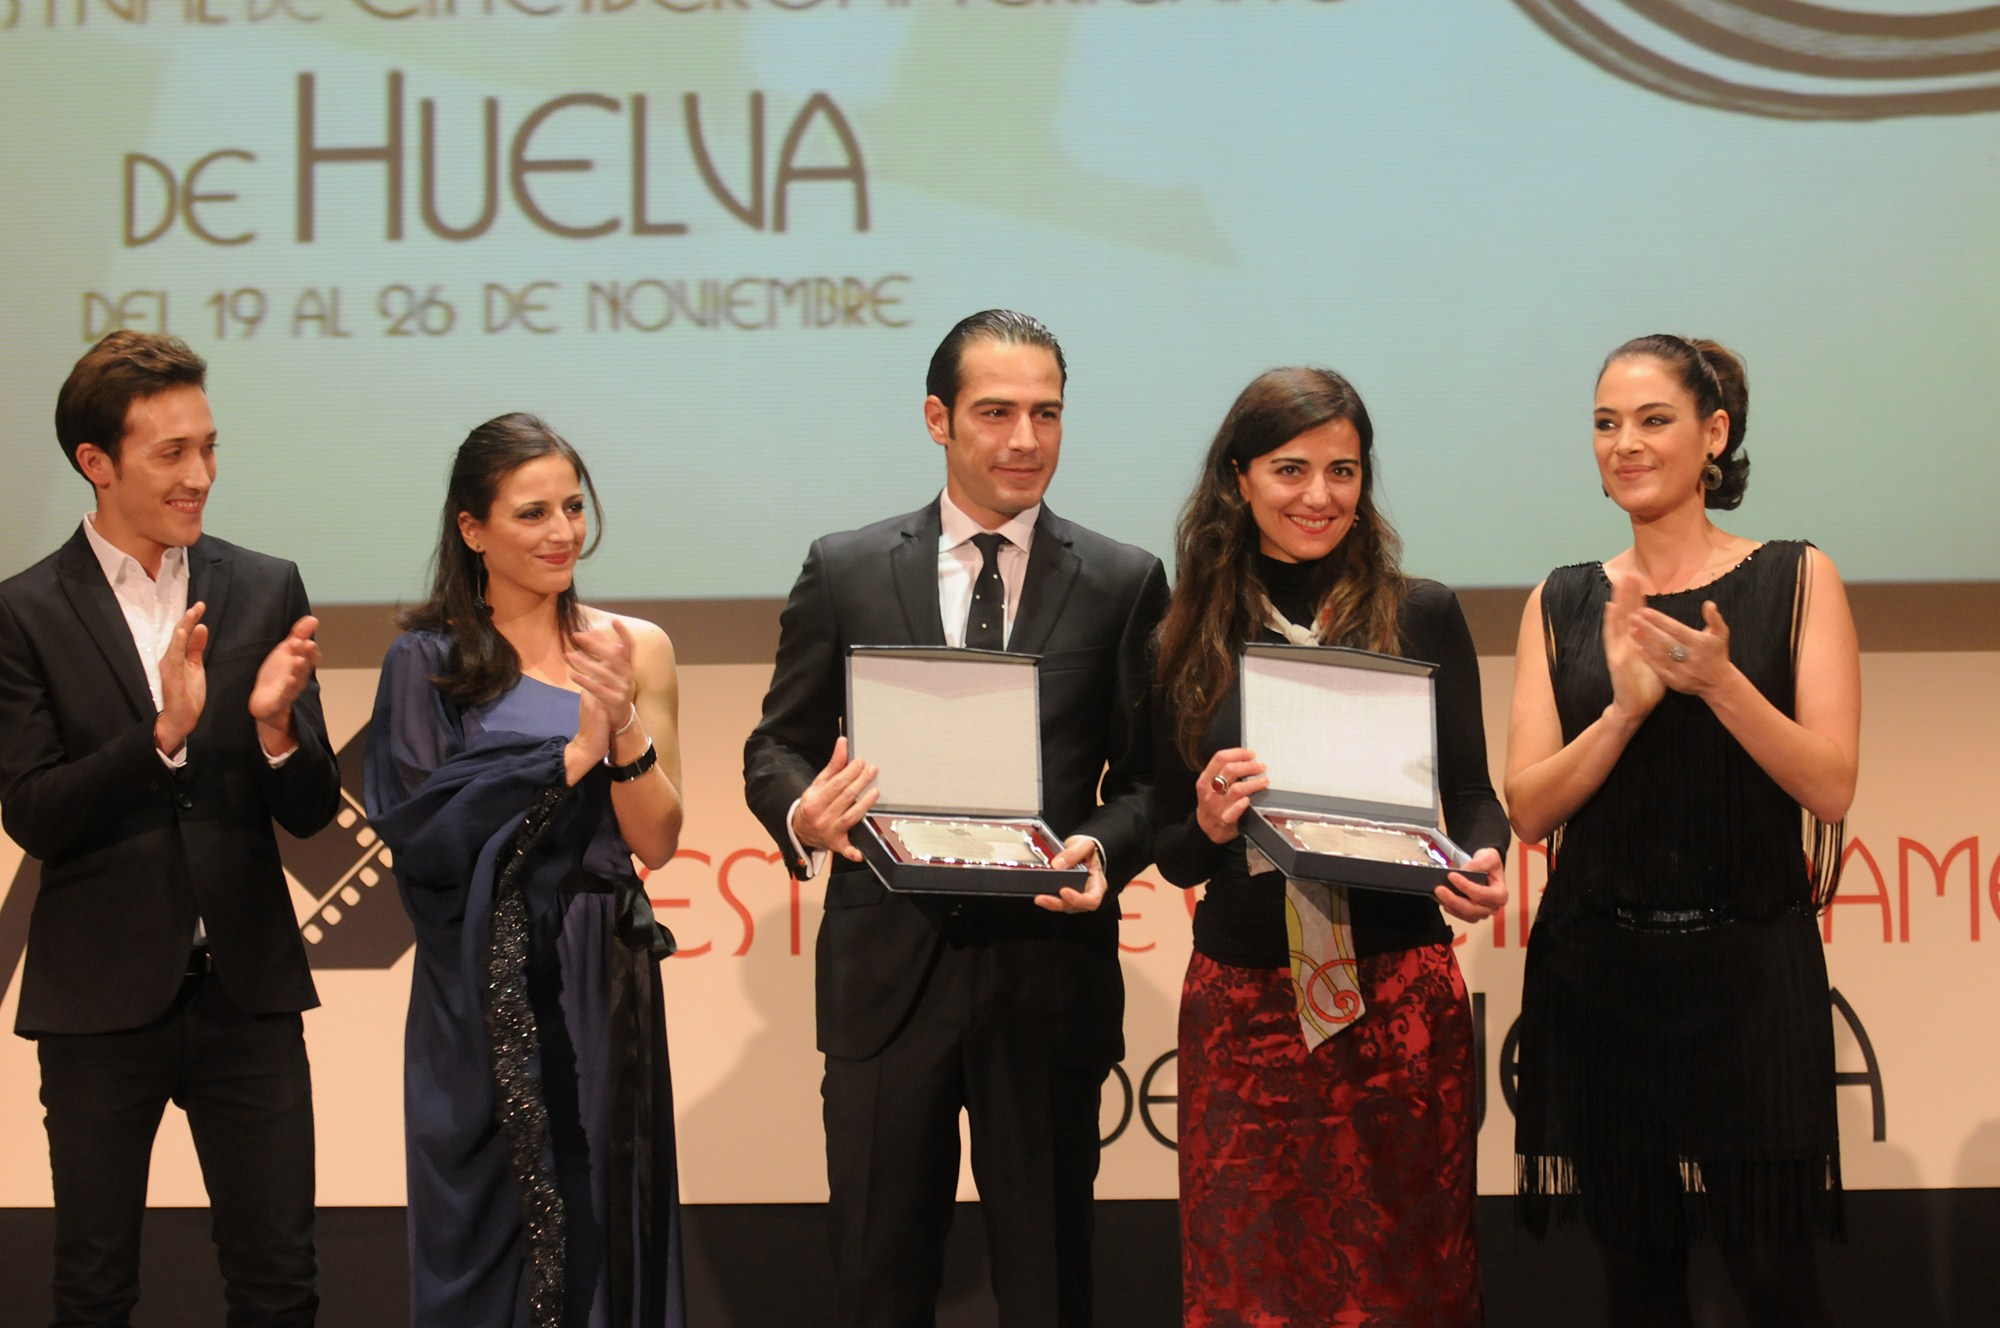 Ruth Núñez entrega un premio en la gala de clausura del Festival de Cine Iberoamericano de Huelva